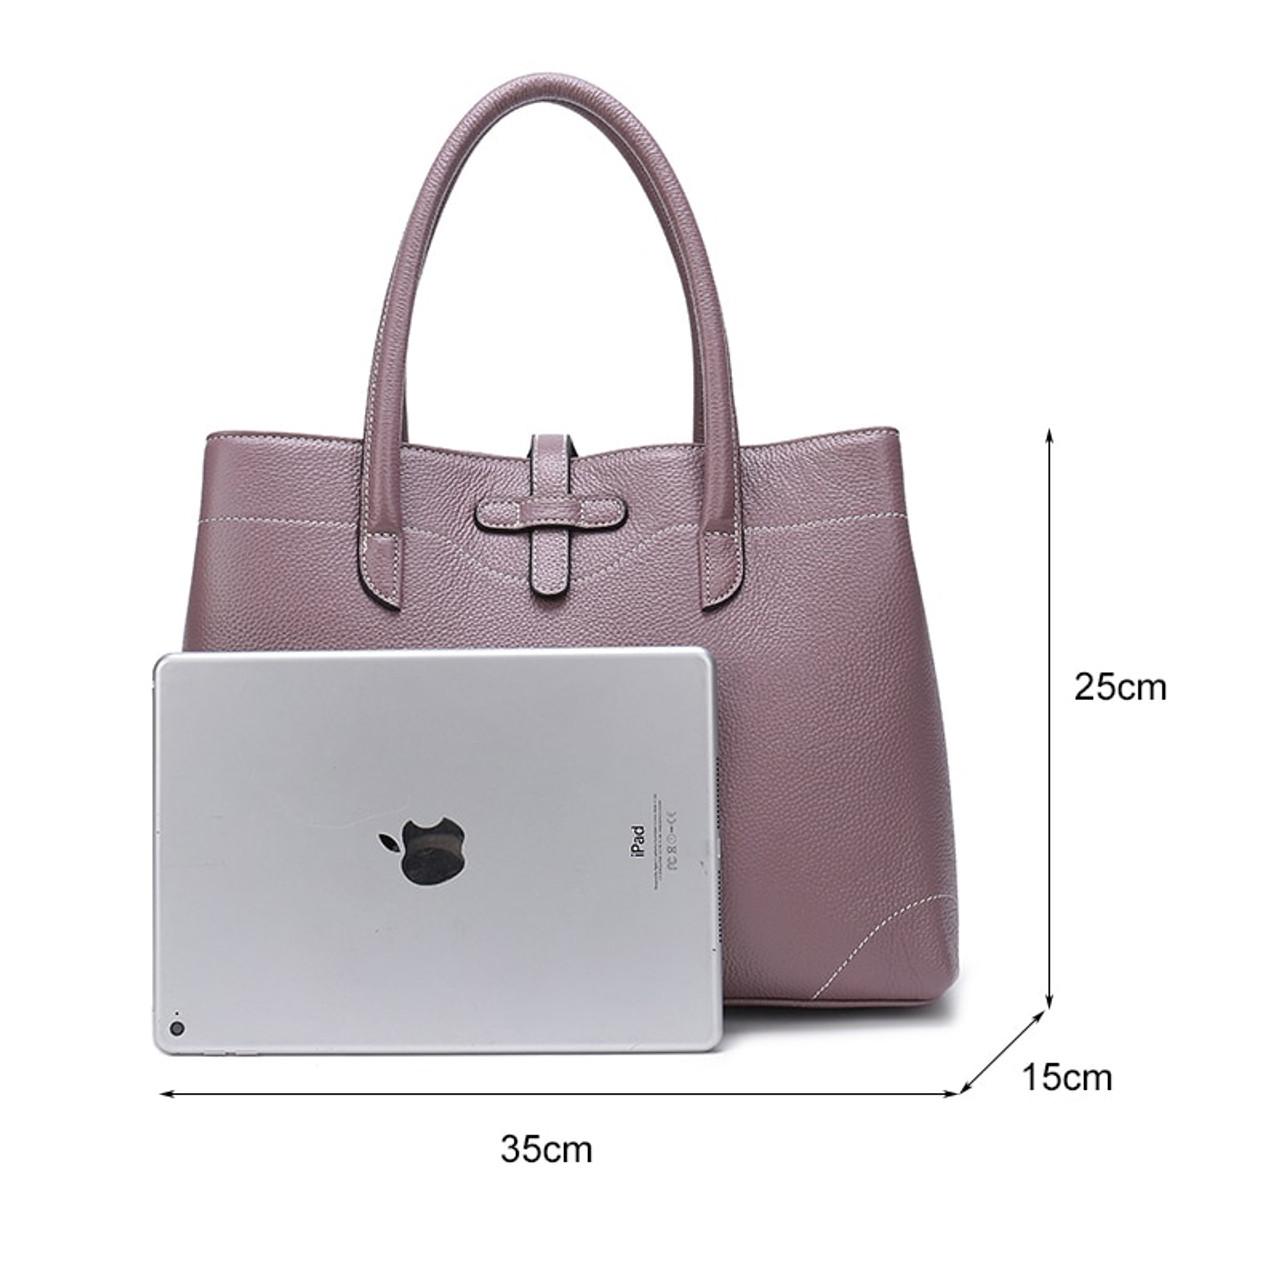 113c7fda06b LY.SHARK Luxury Handbags Women Bags Designer Genuine Leather Bags For Women  Hand bag Female Top-Handle Bag Ladies Tote 2019